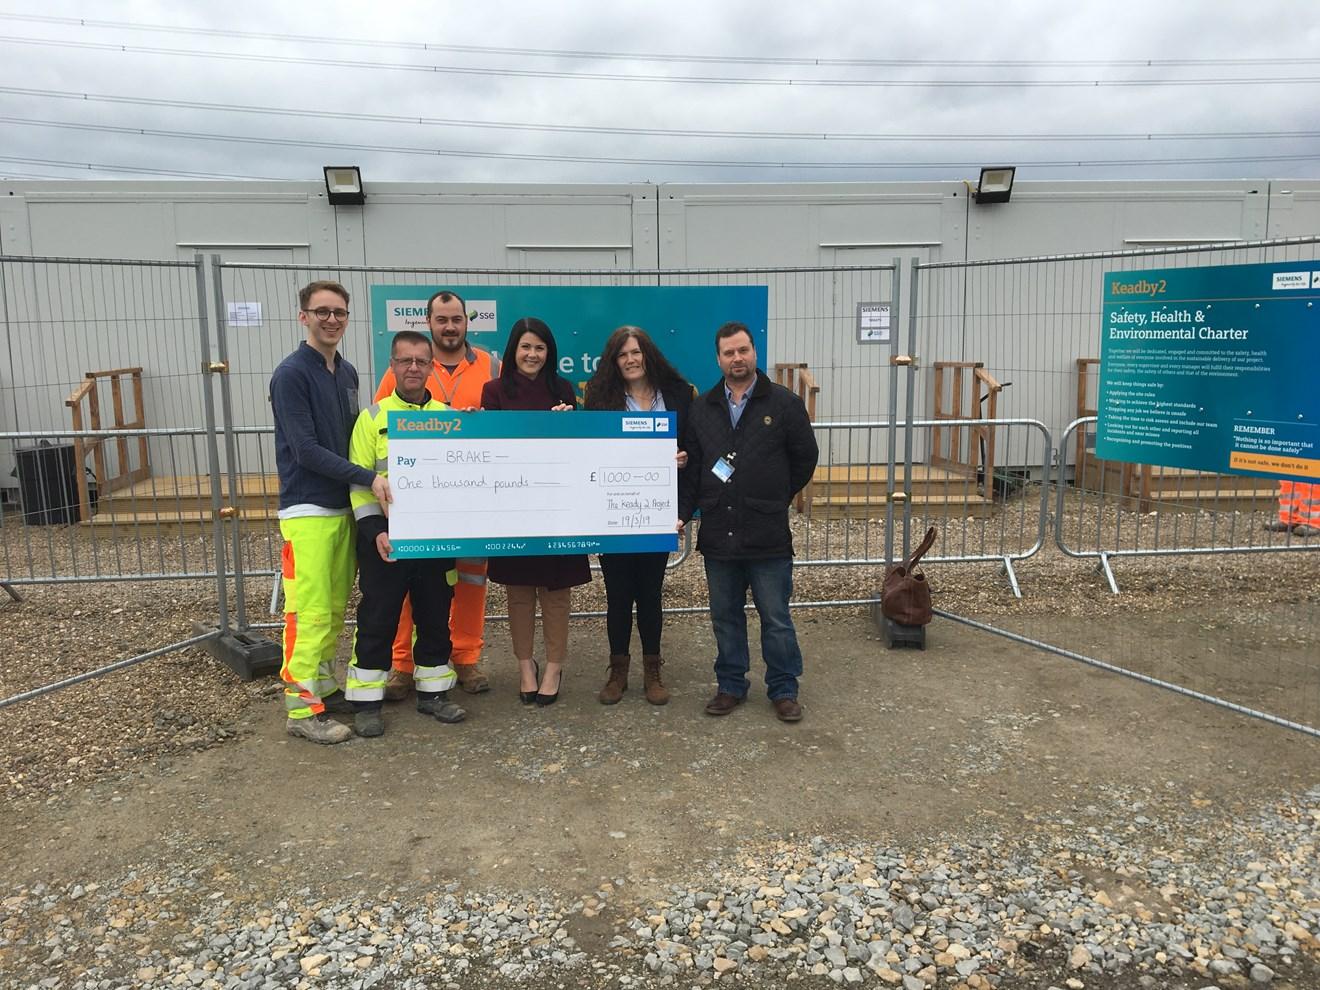 Keadby 2 supports road safety charity BRAKE with £1,000 donation: BRAKEDonationImage